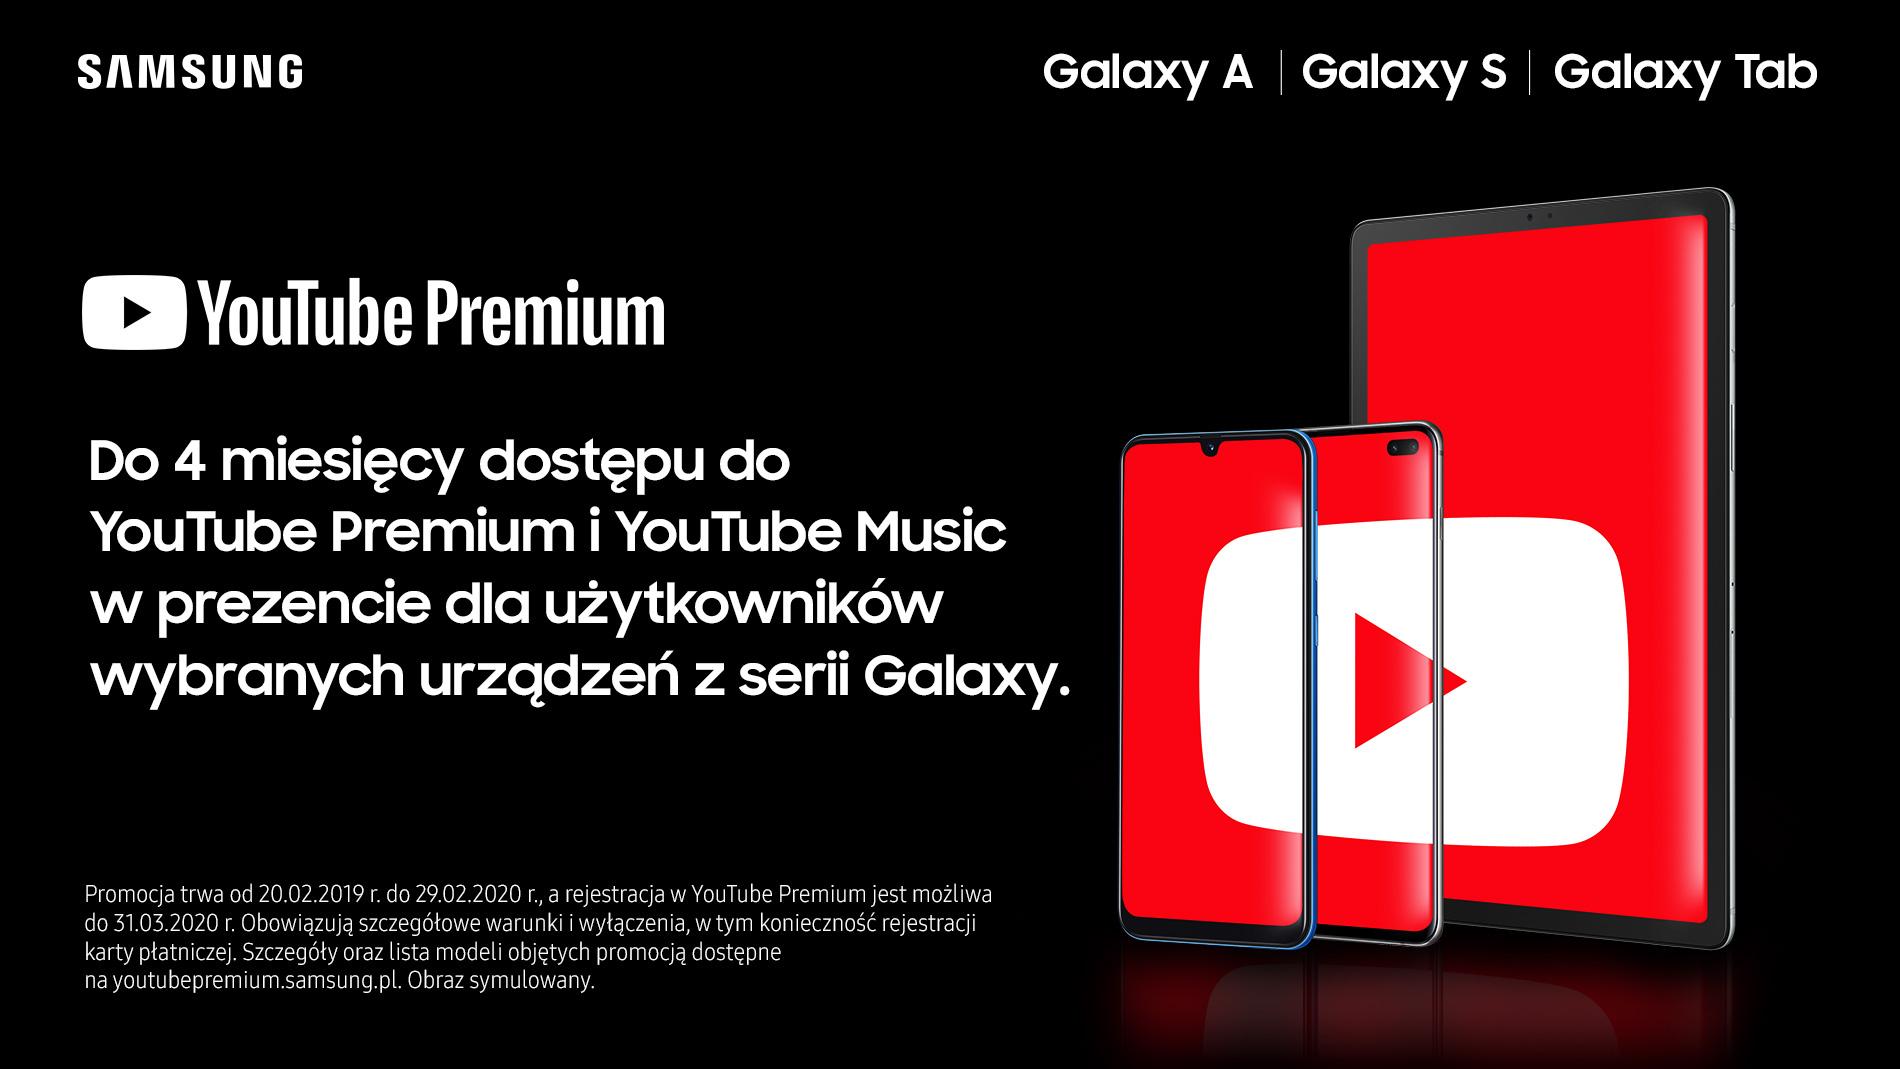 YouTube Premium na smartfony tablety Samsung Galaxy za darmo